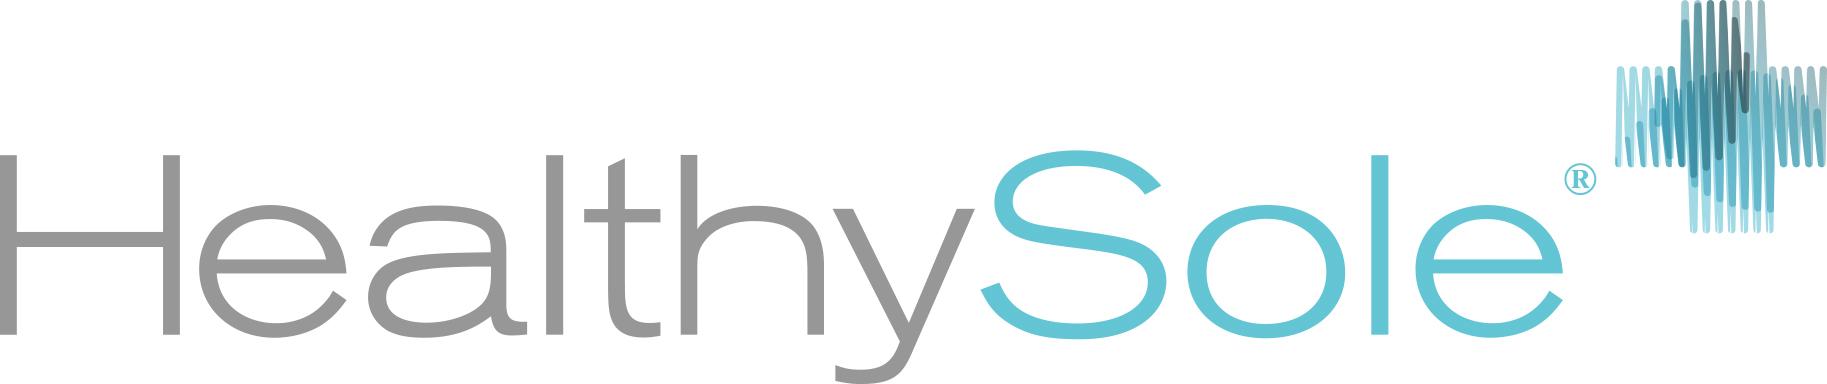 HS-Plus-Logo